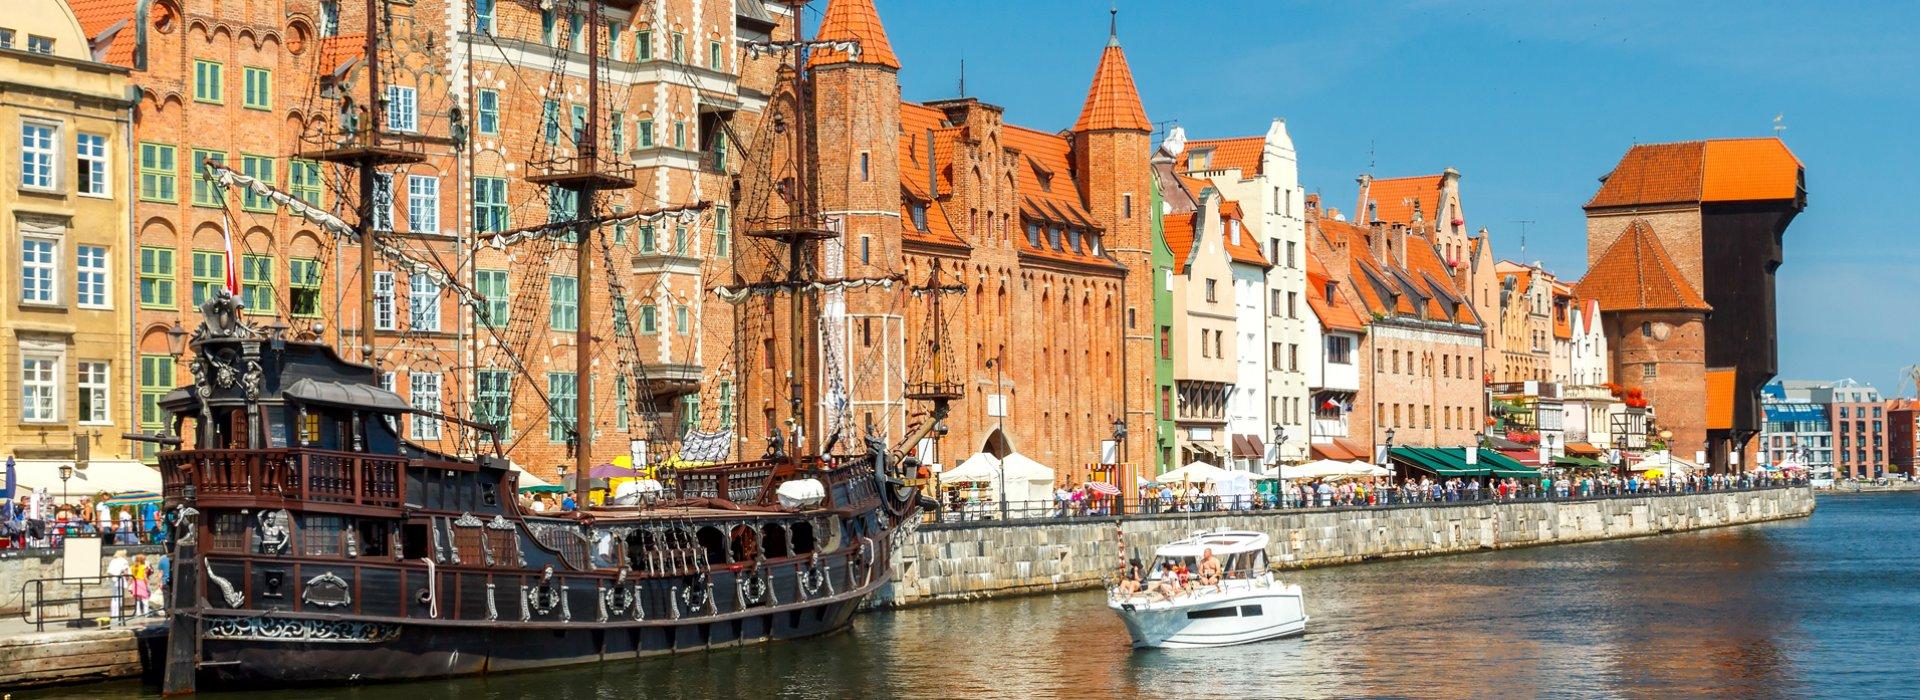 Old Town of Gdańsk